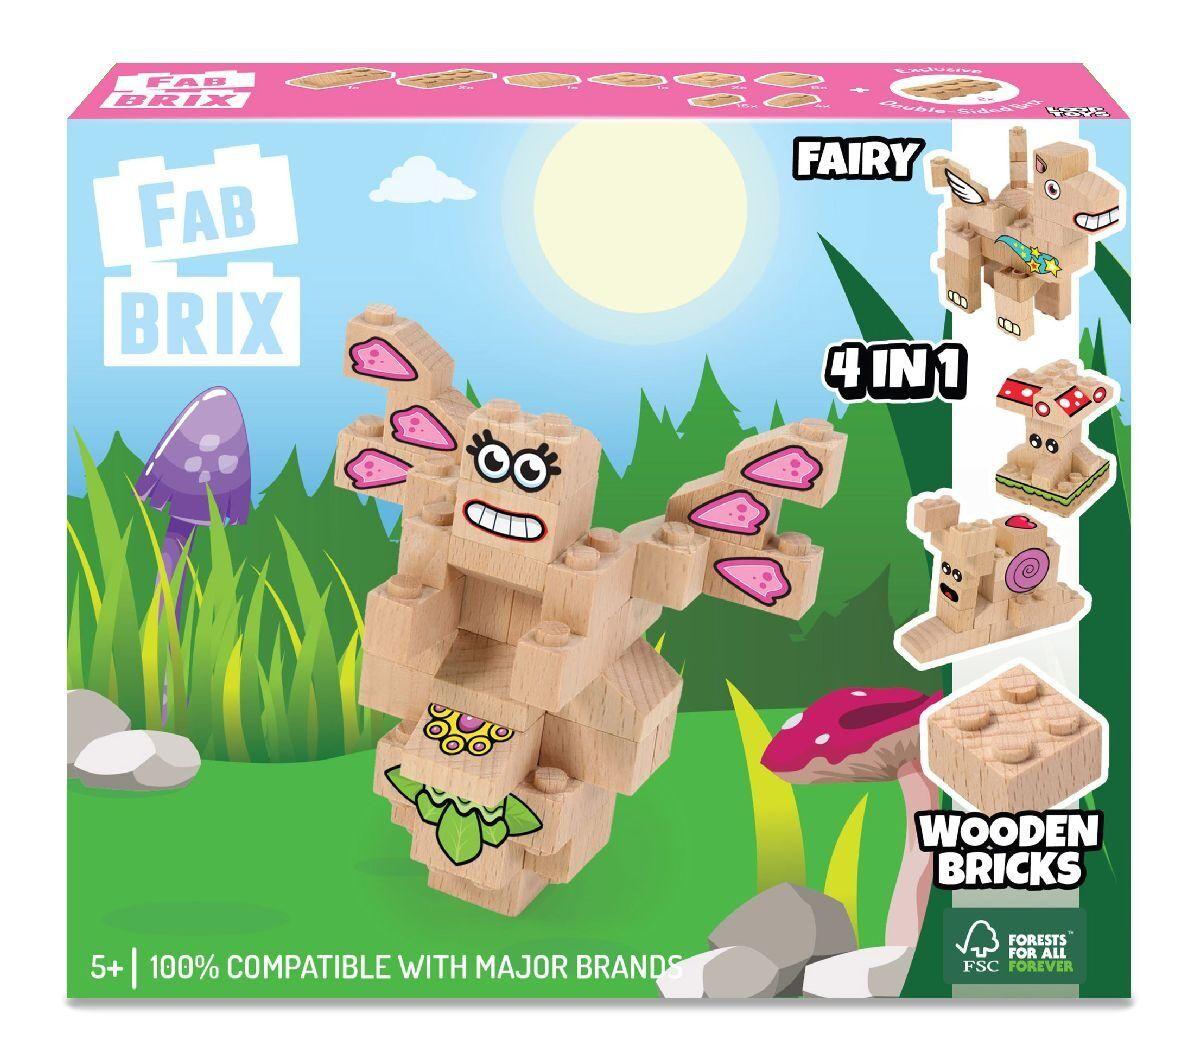 Конструктор FabBRIX JG 1810 Fairy (Казкові герої)